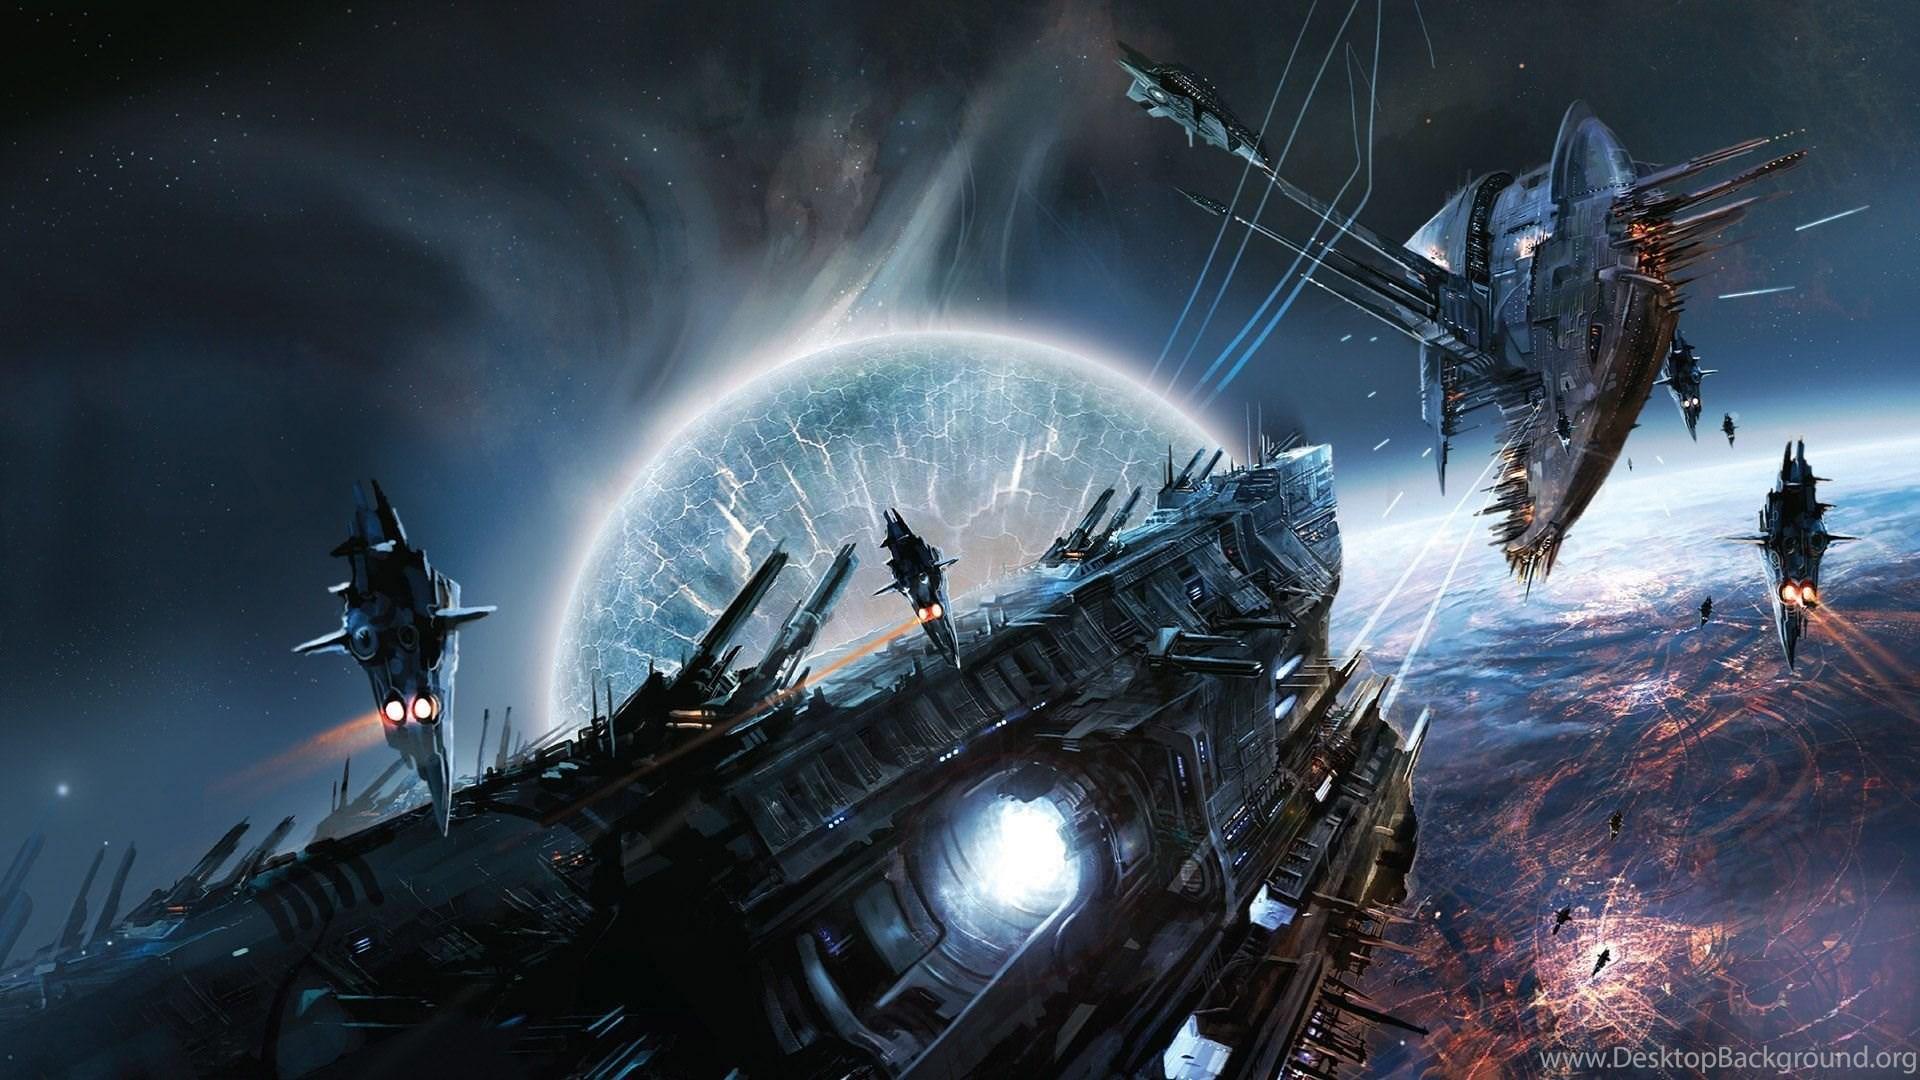 Space War Desktop Wallpaper Images Background